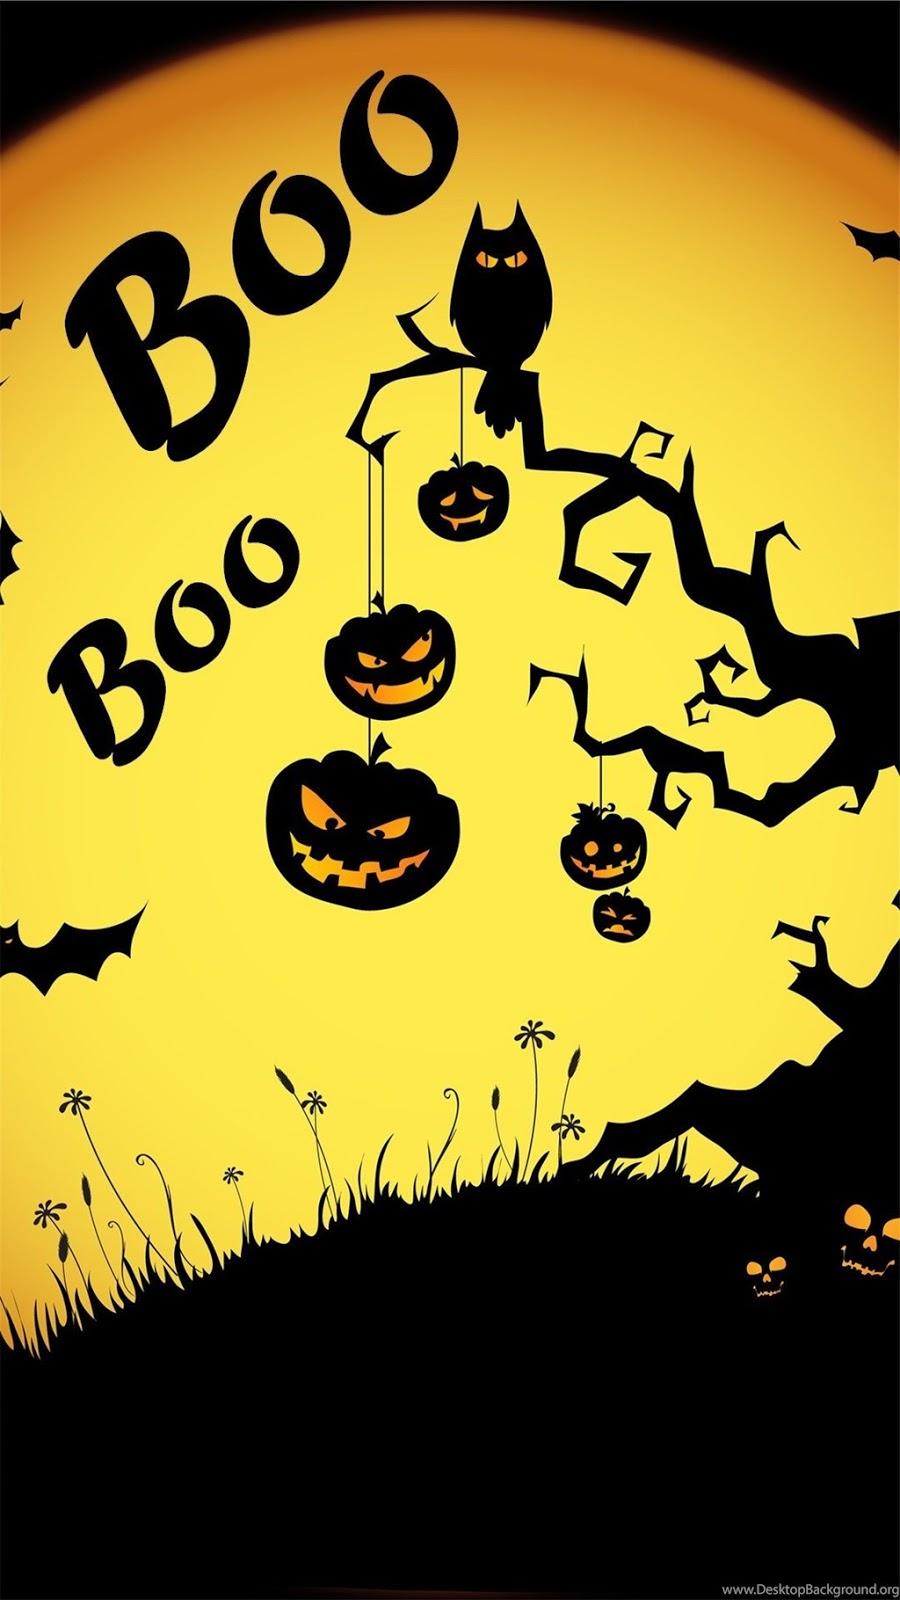 Halloween Hd Wallpaper For Iphone 6 Plus 5 5c Ipad 2 Happy